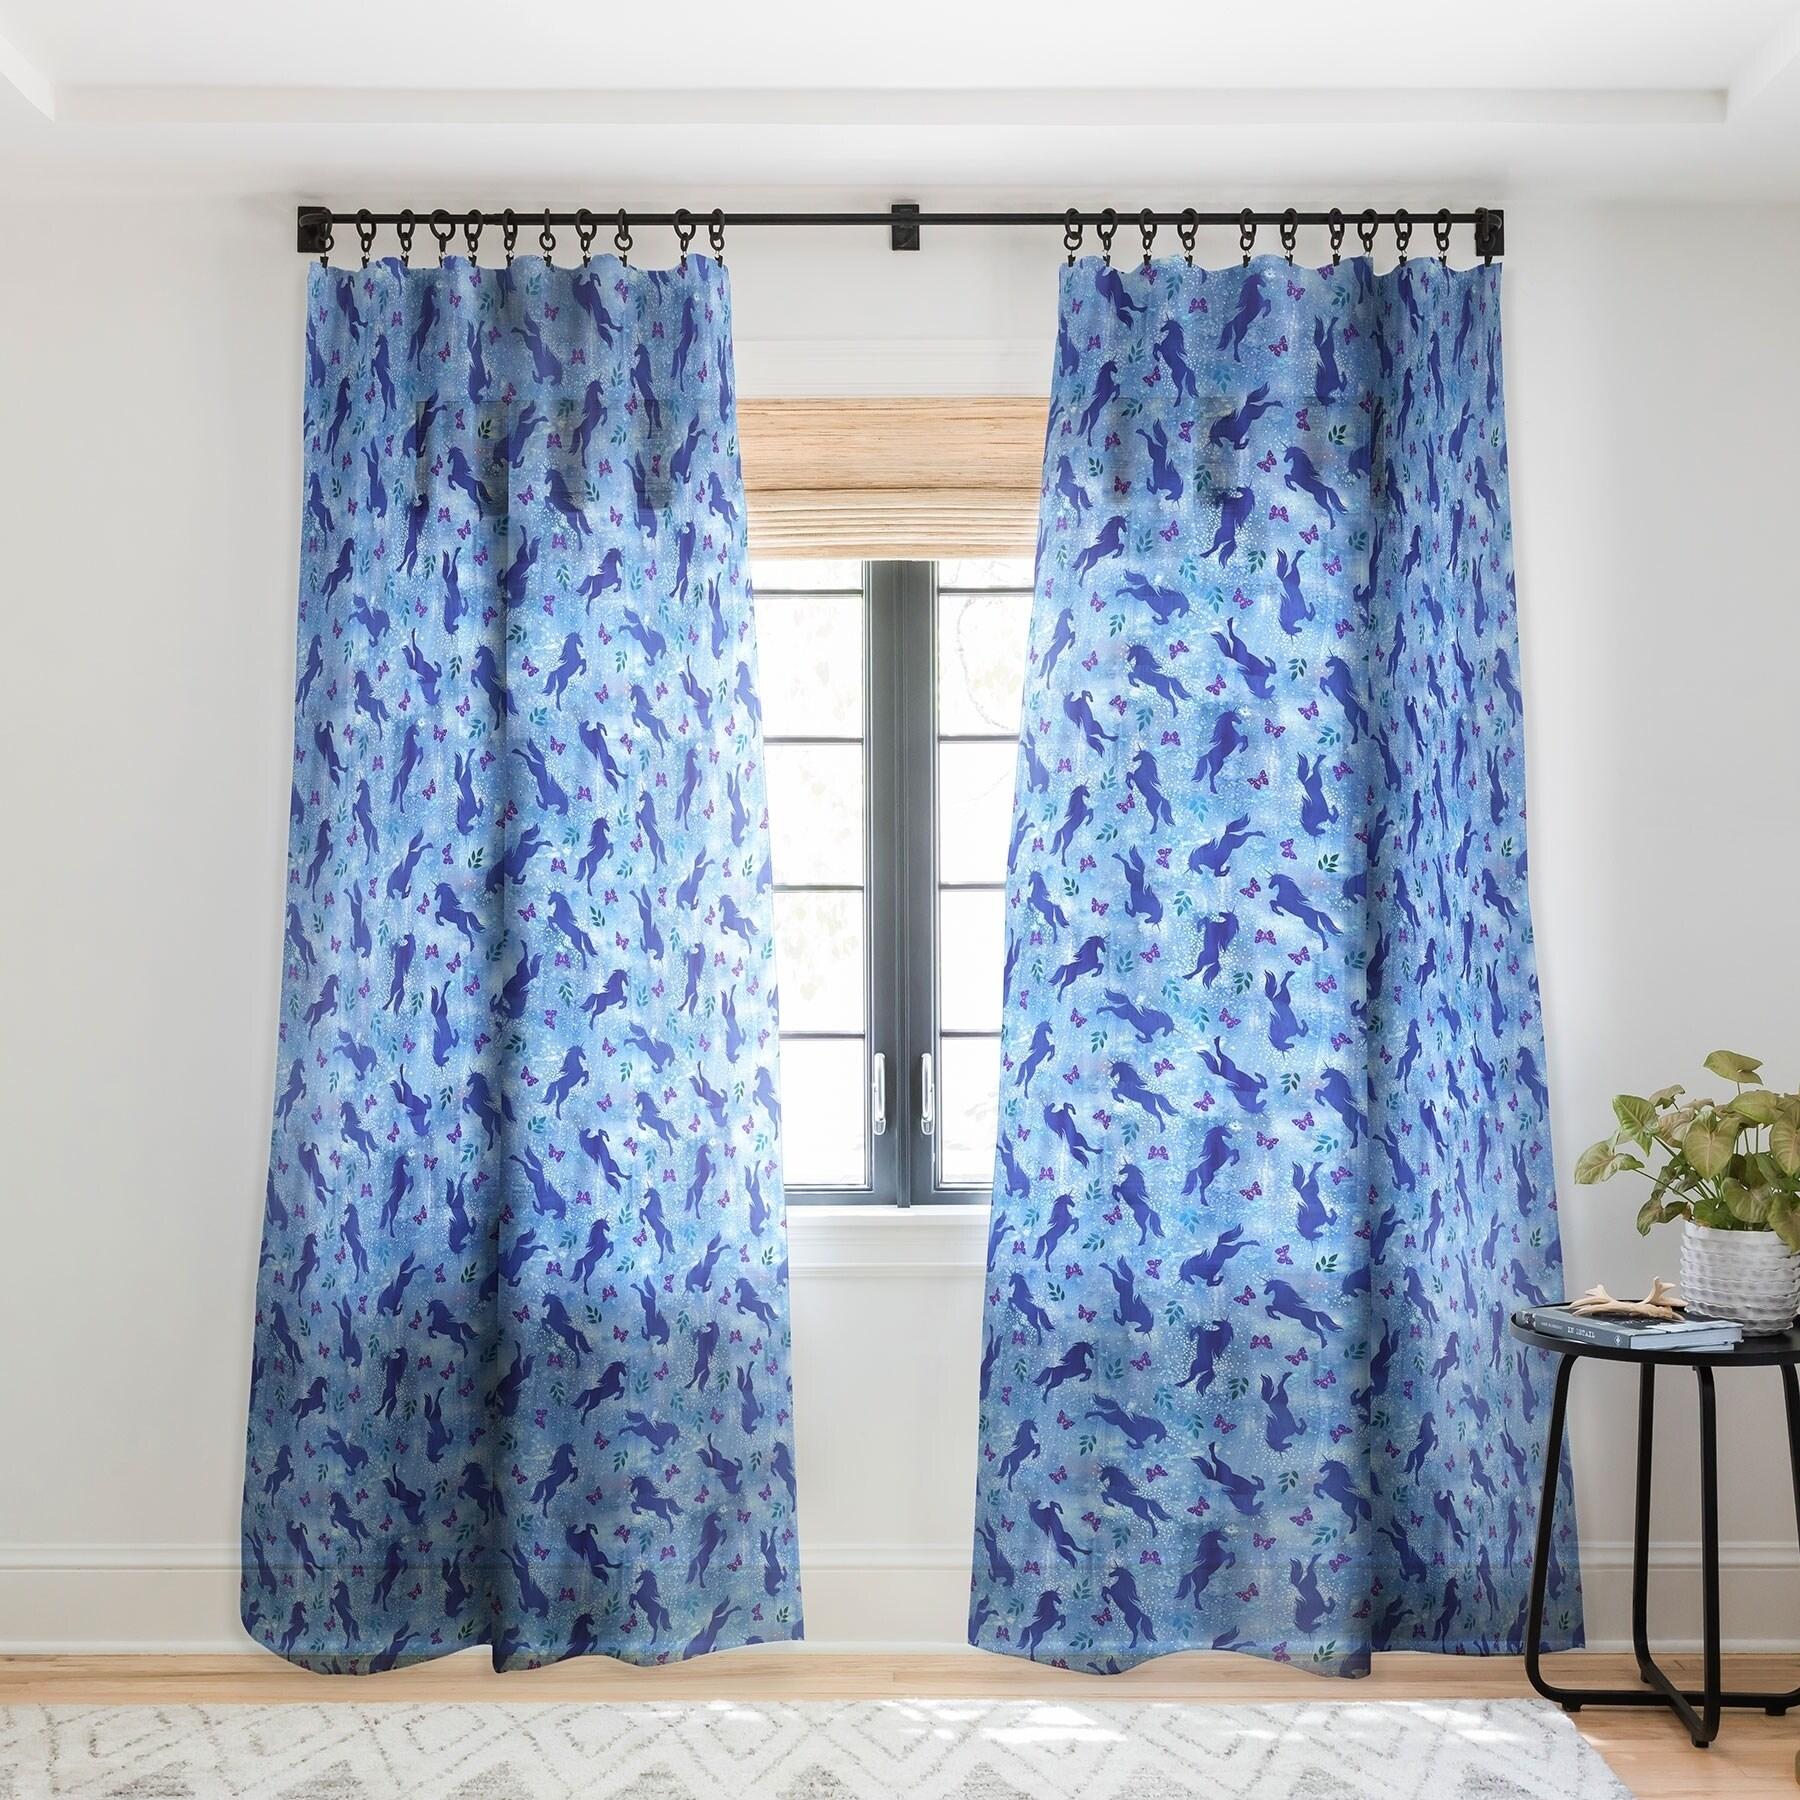 Schatzi Brown Unicorn Toss Light Blue Single Panel Sheer Curtain 50 X 84 On Sale Overstock 22043602